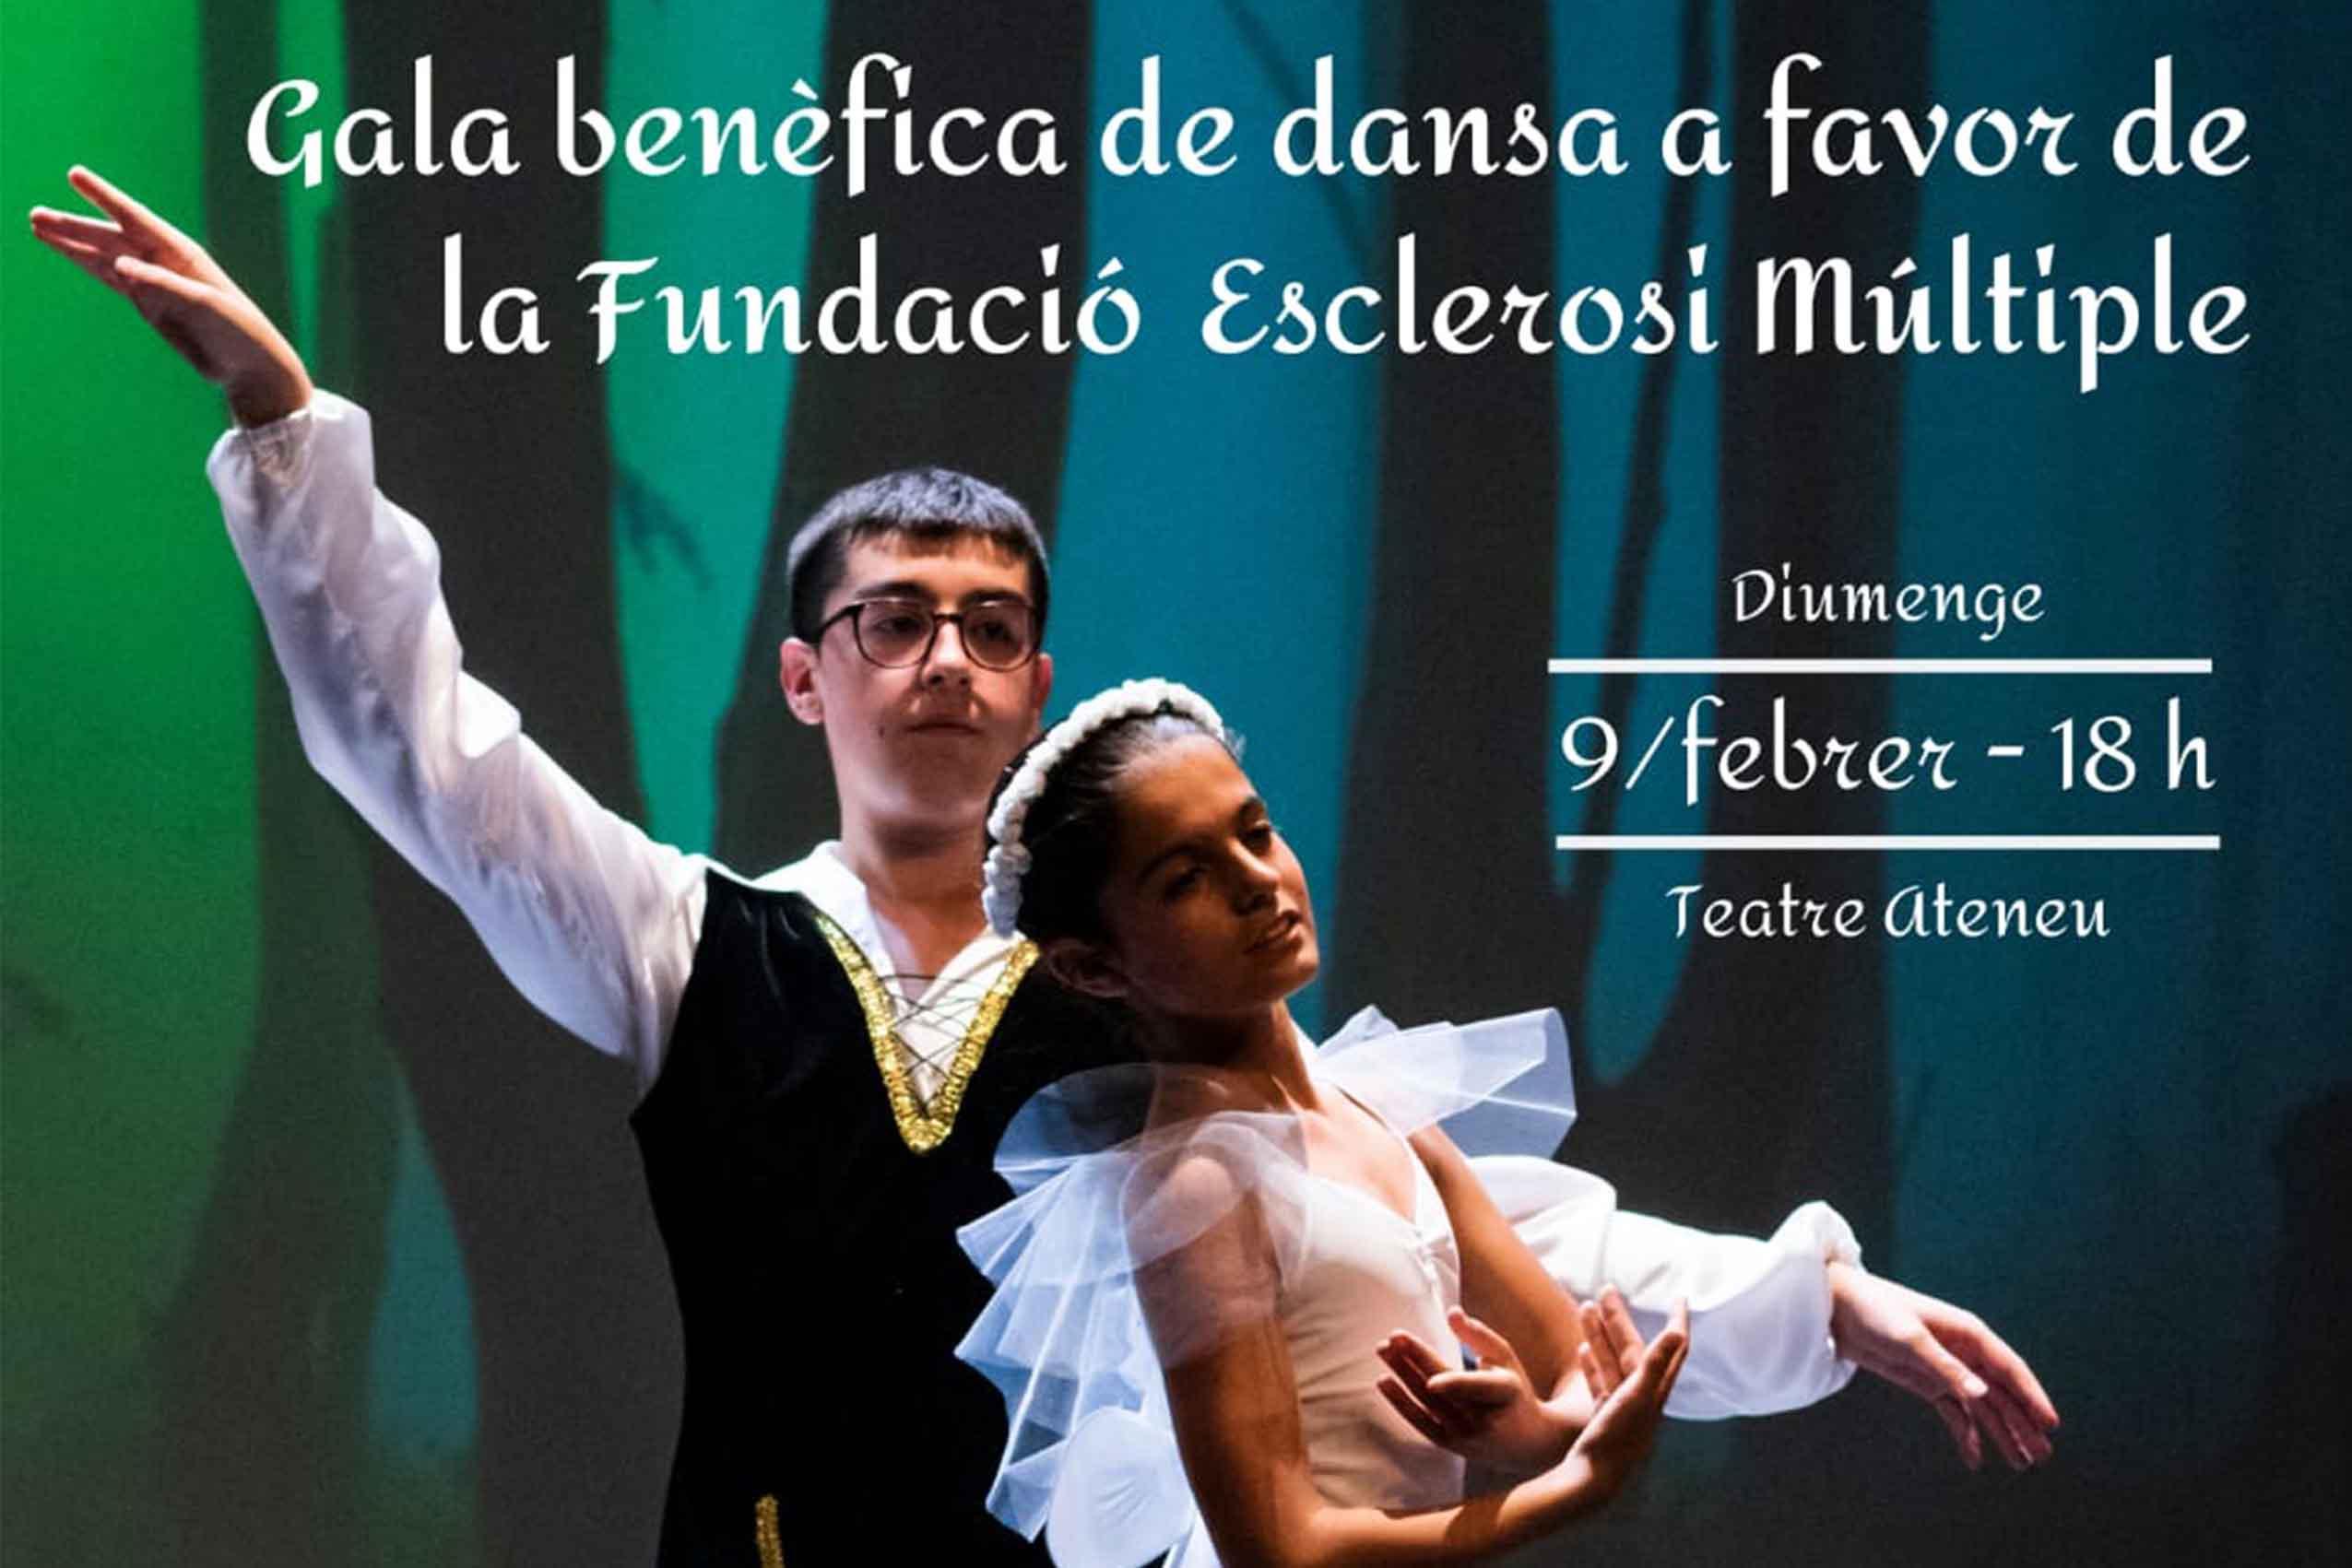 Danza solidaria en Tárrega